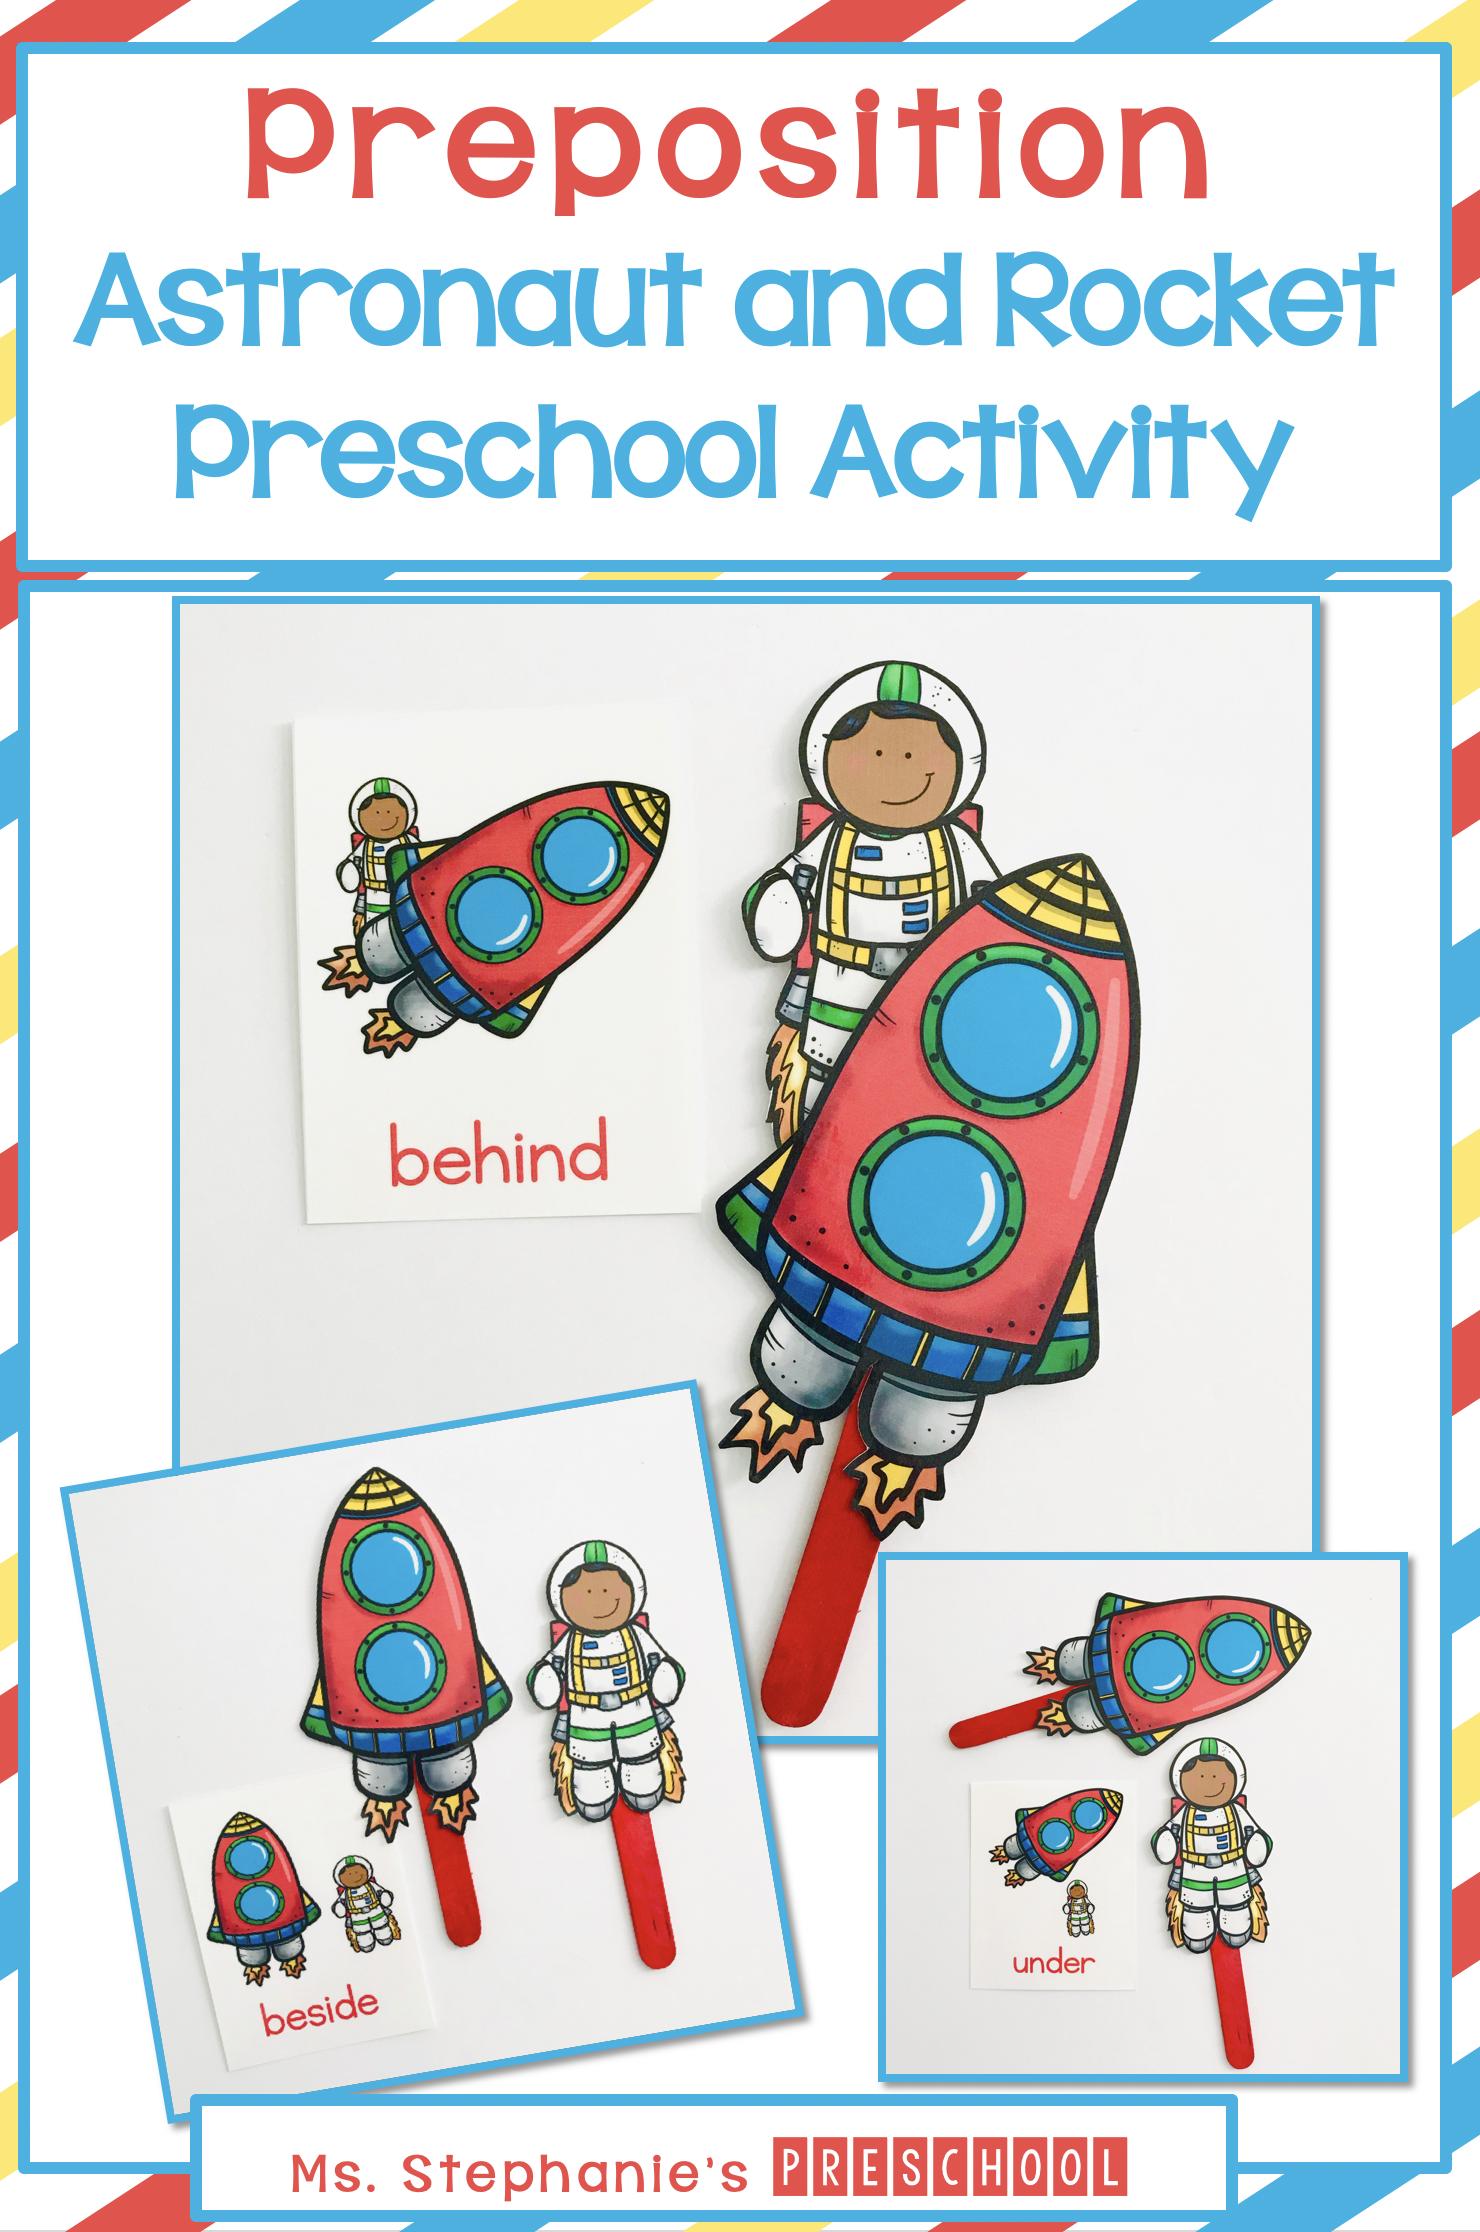 Astronaut And Rocket Preposition Preschool Activity In